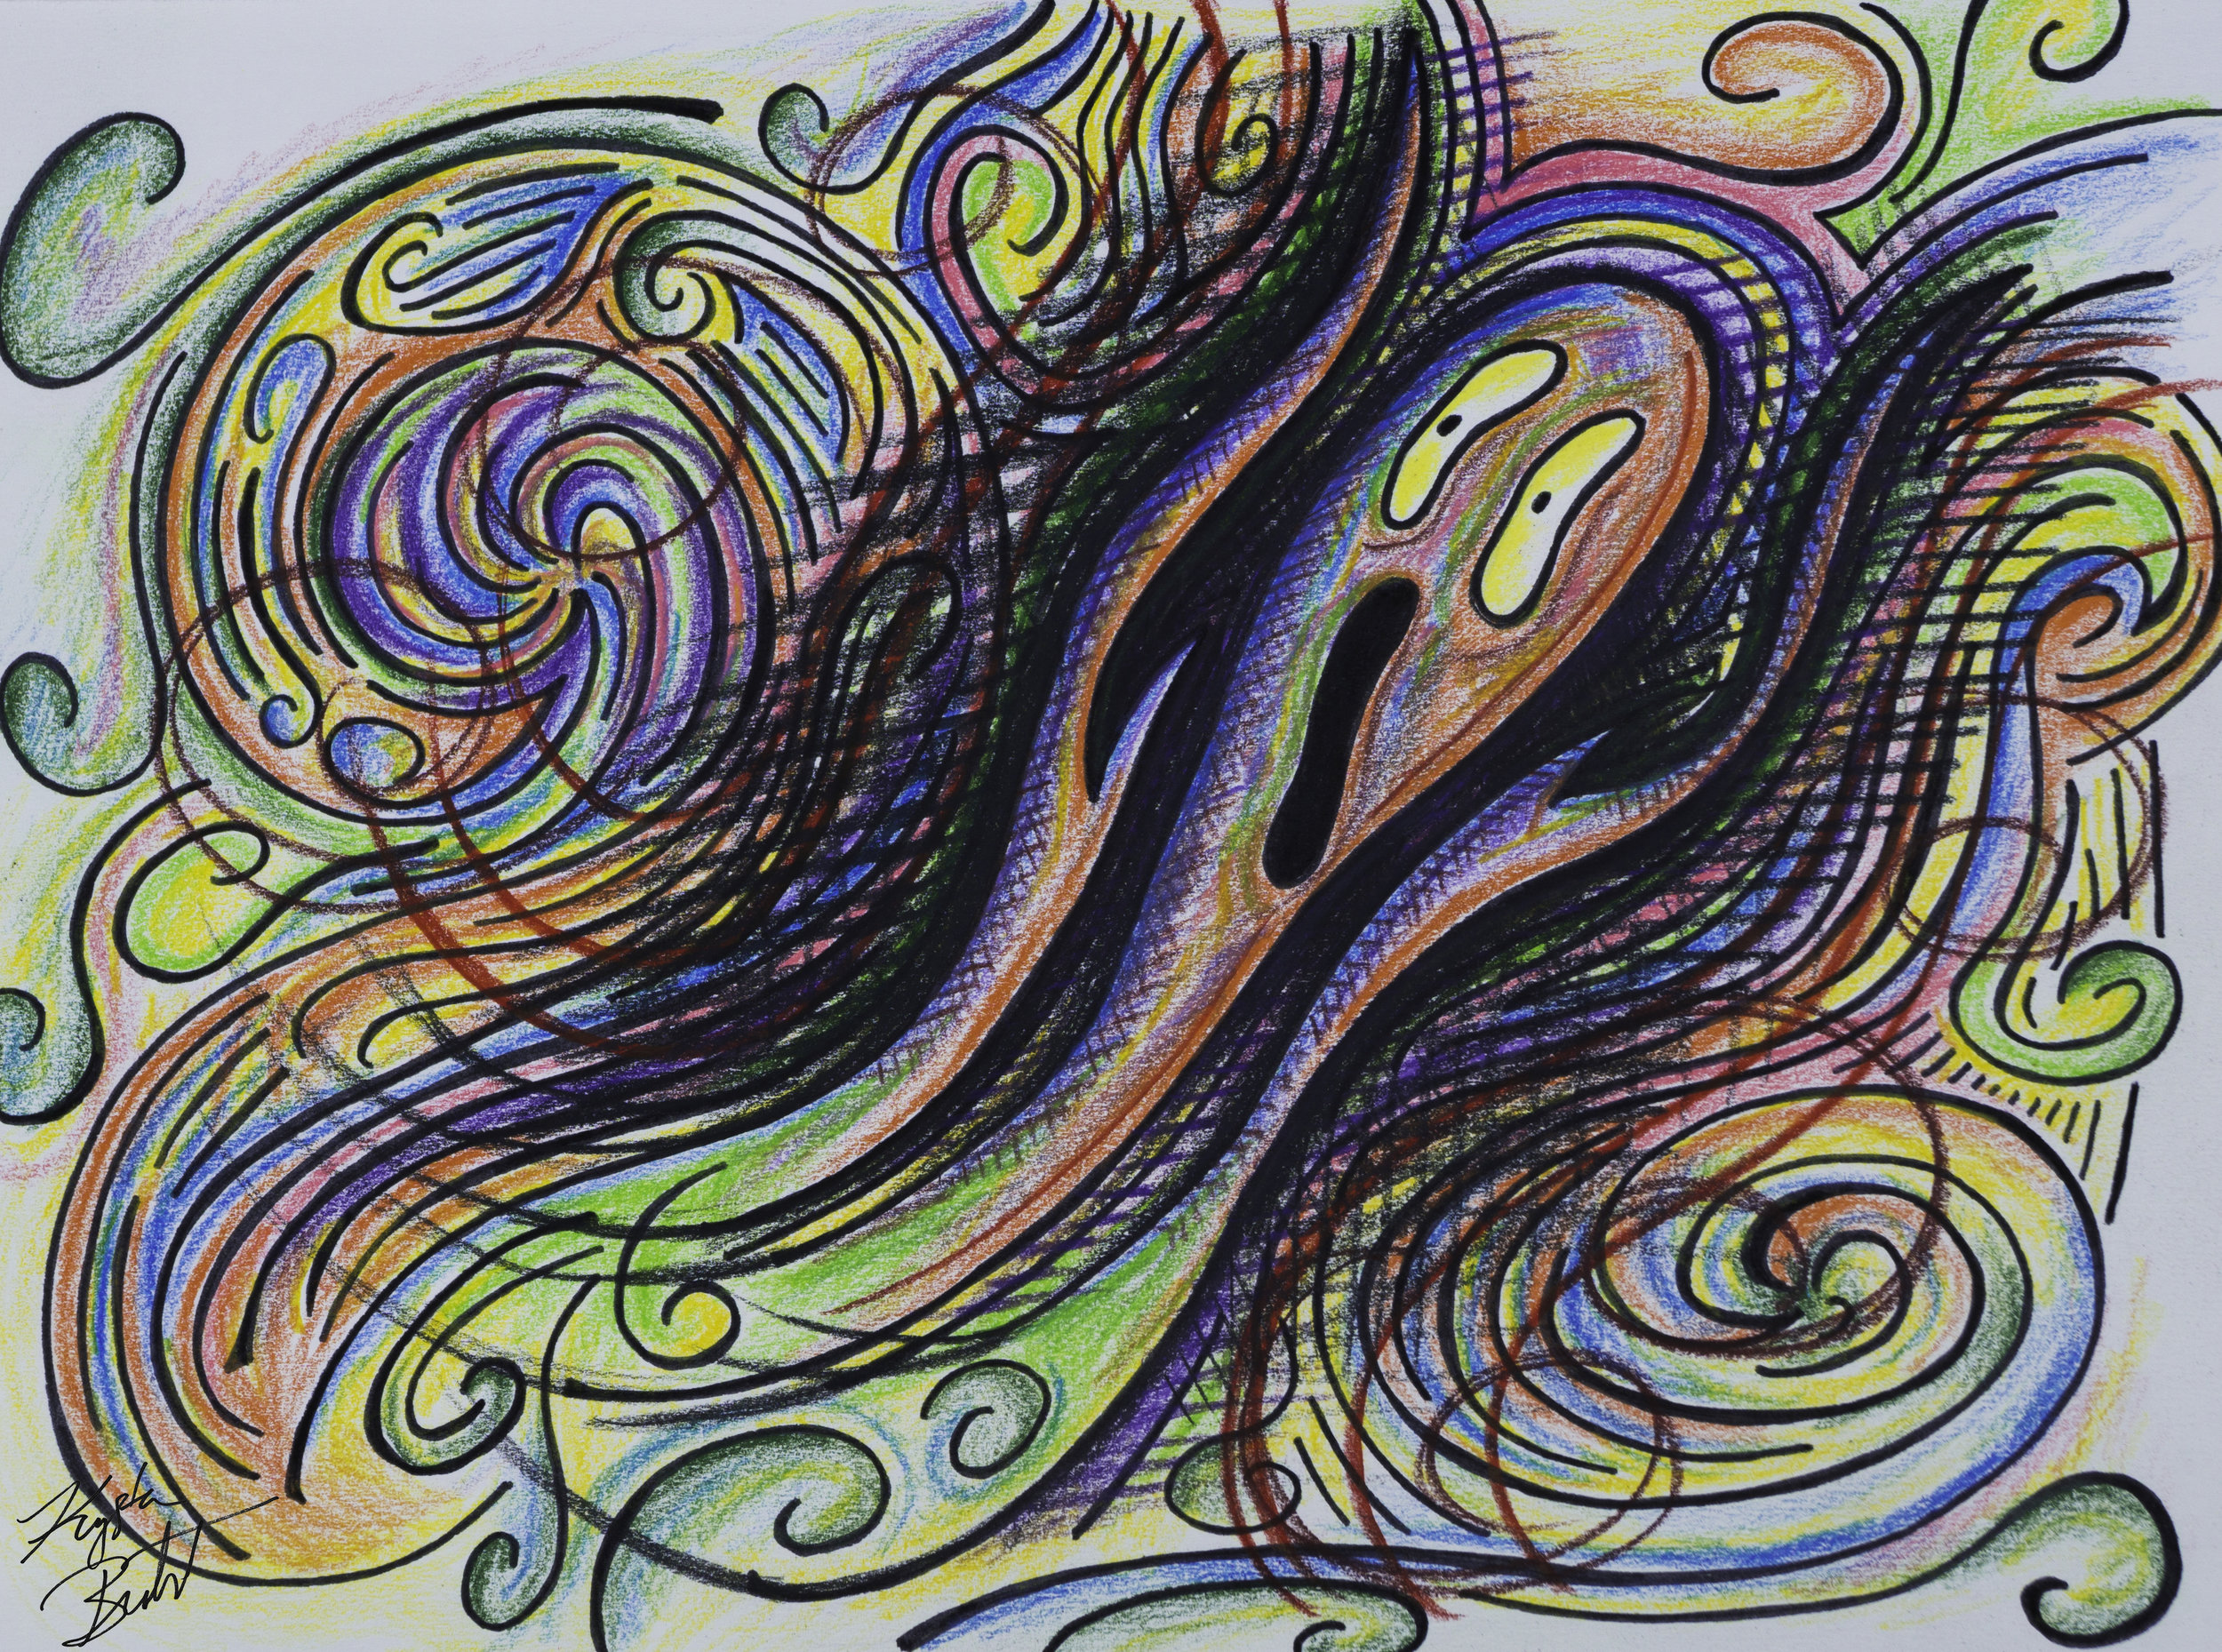 """#anxiety"" by Krysta bernhardt (emoji, pencil and ink, scream)"